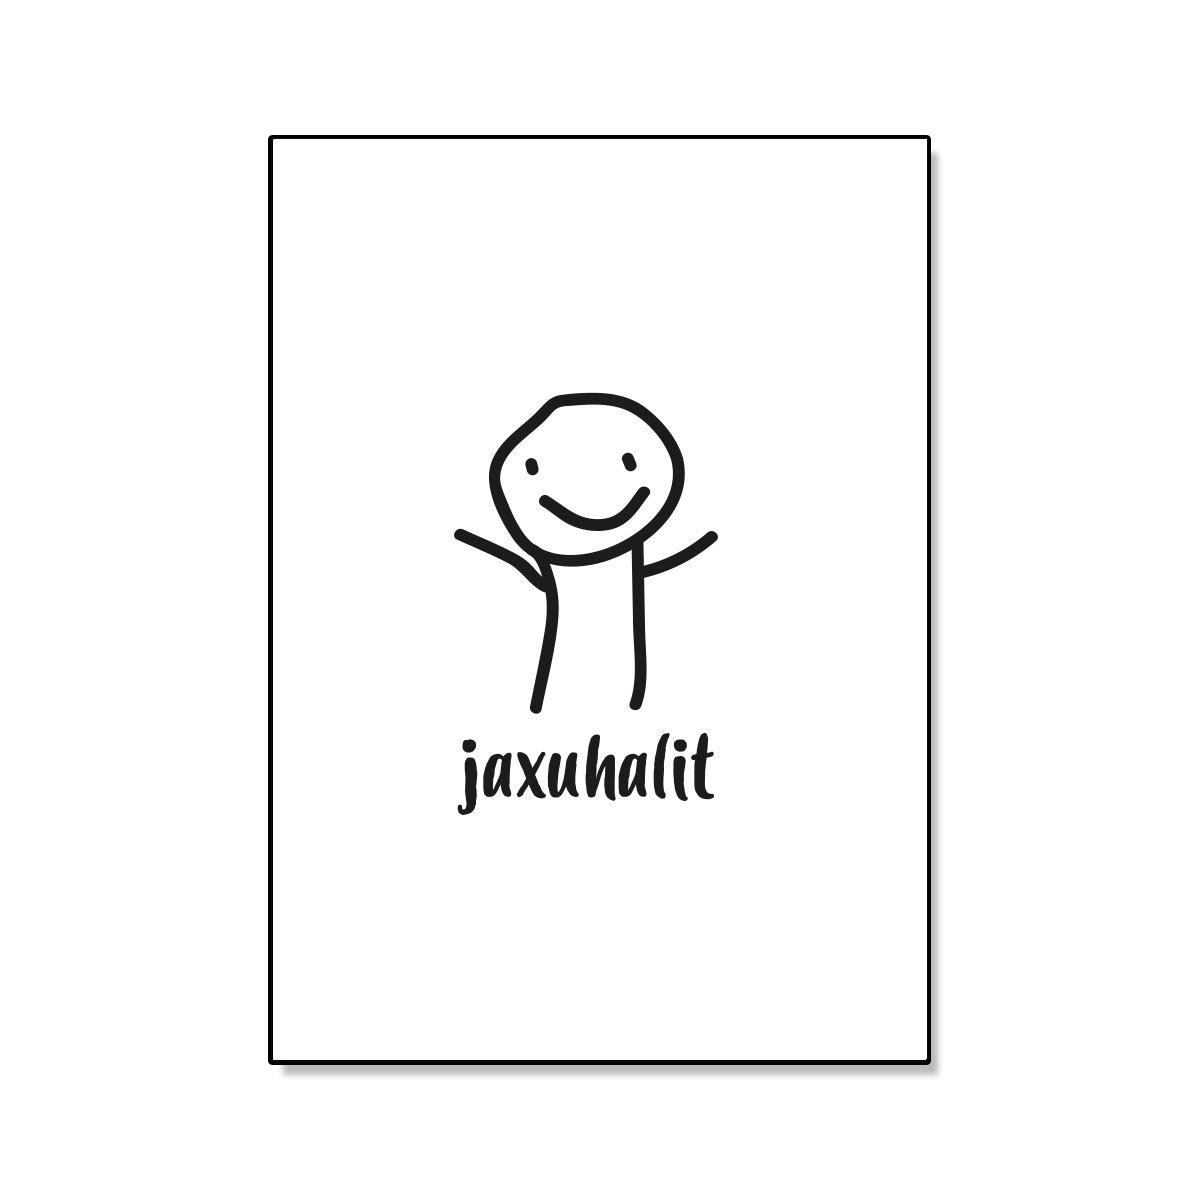 Jaxuhalit, postikortti, Paskakauppa